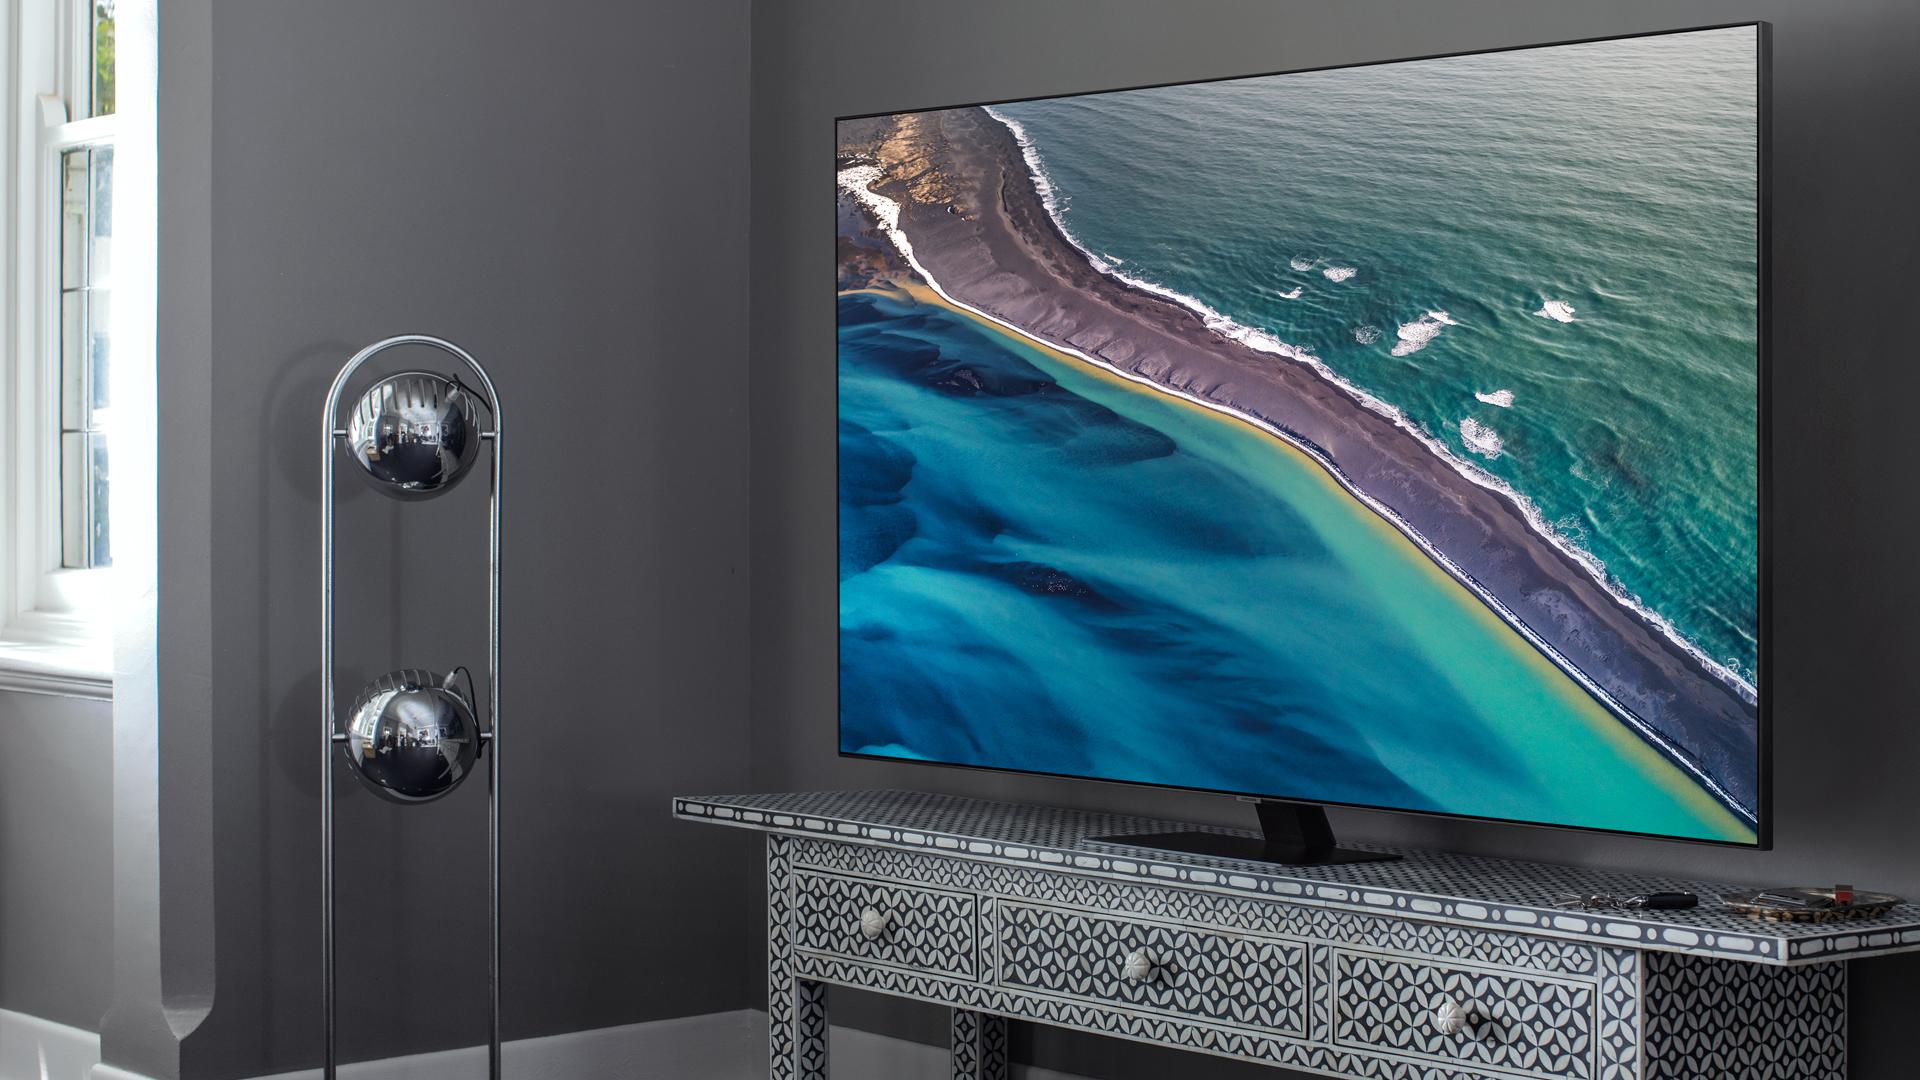 Samsung Q80t Qled Tv Review Techradar